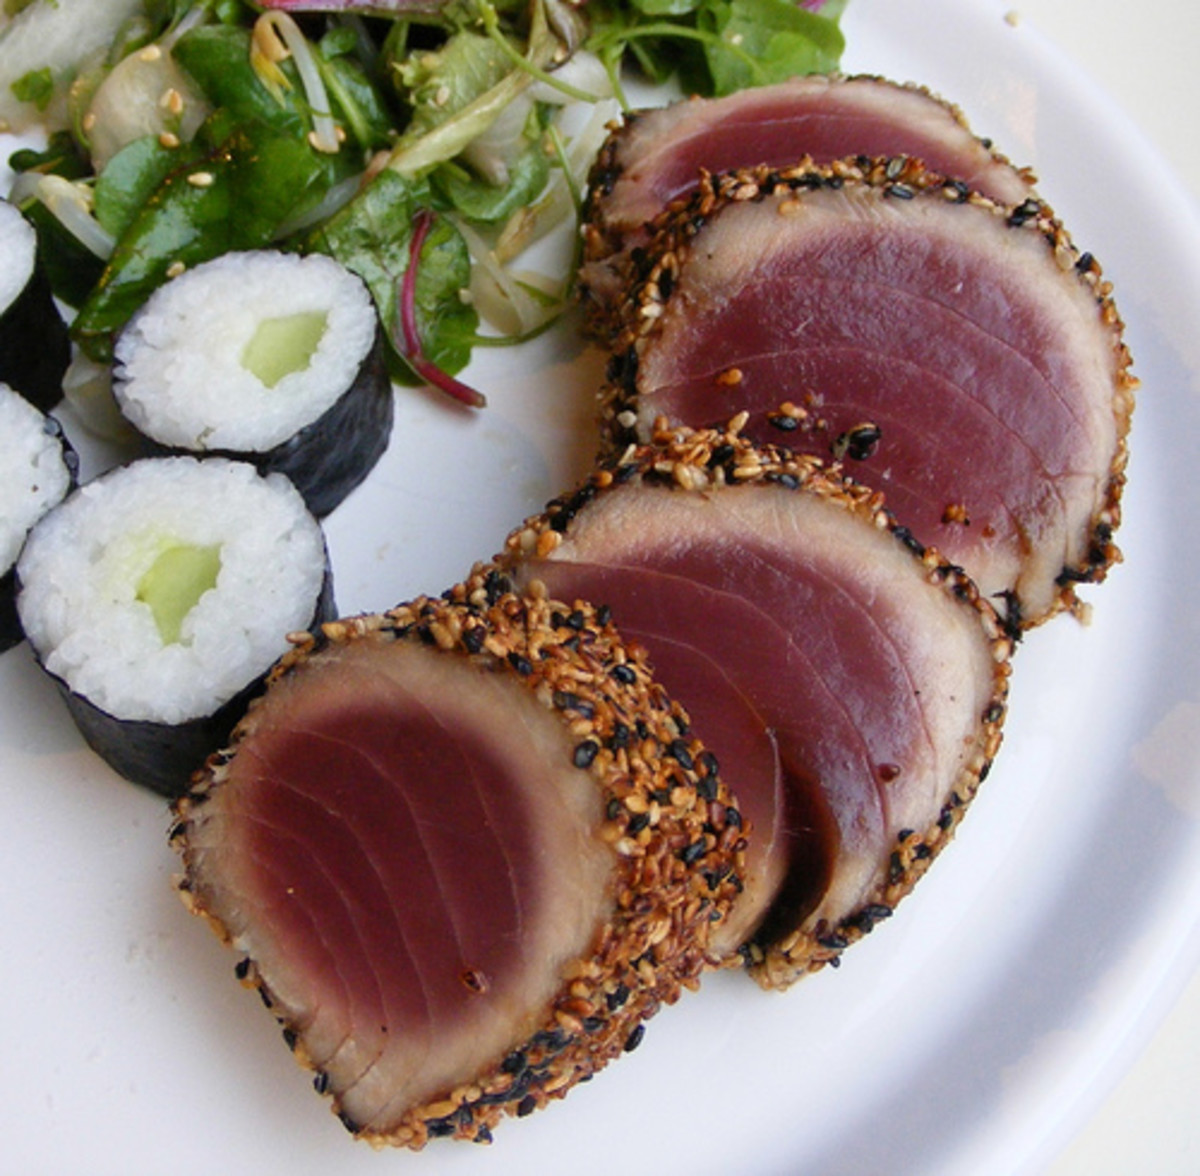 Tuna is a source of Vitamin B